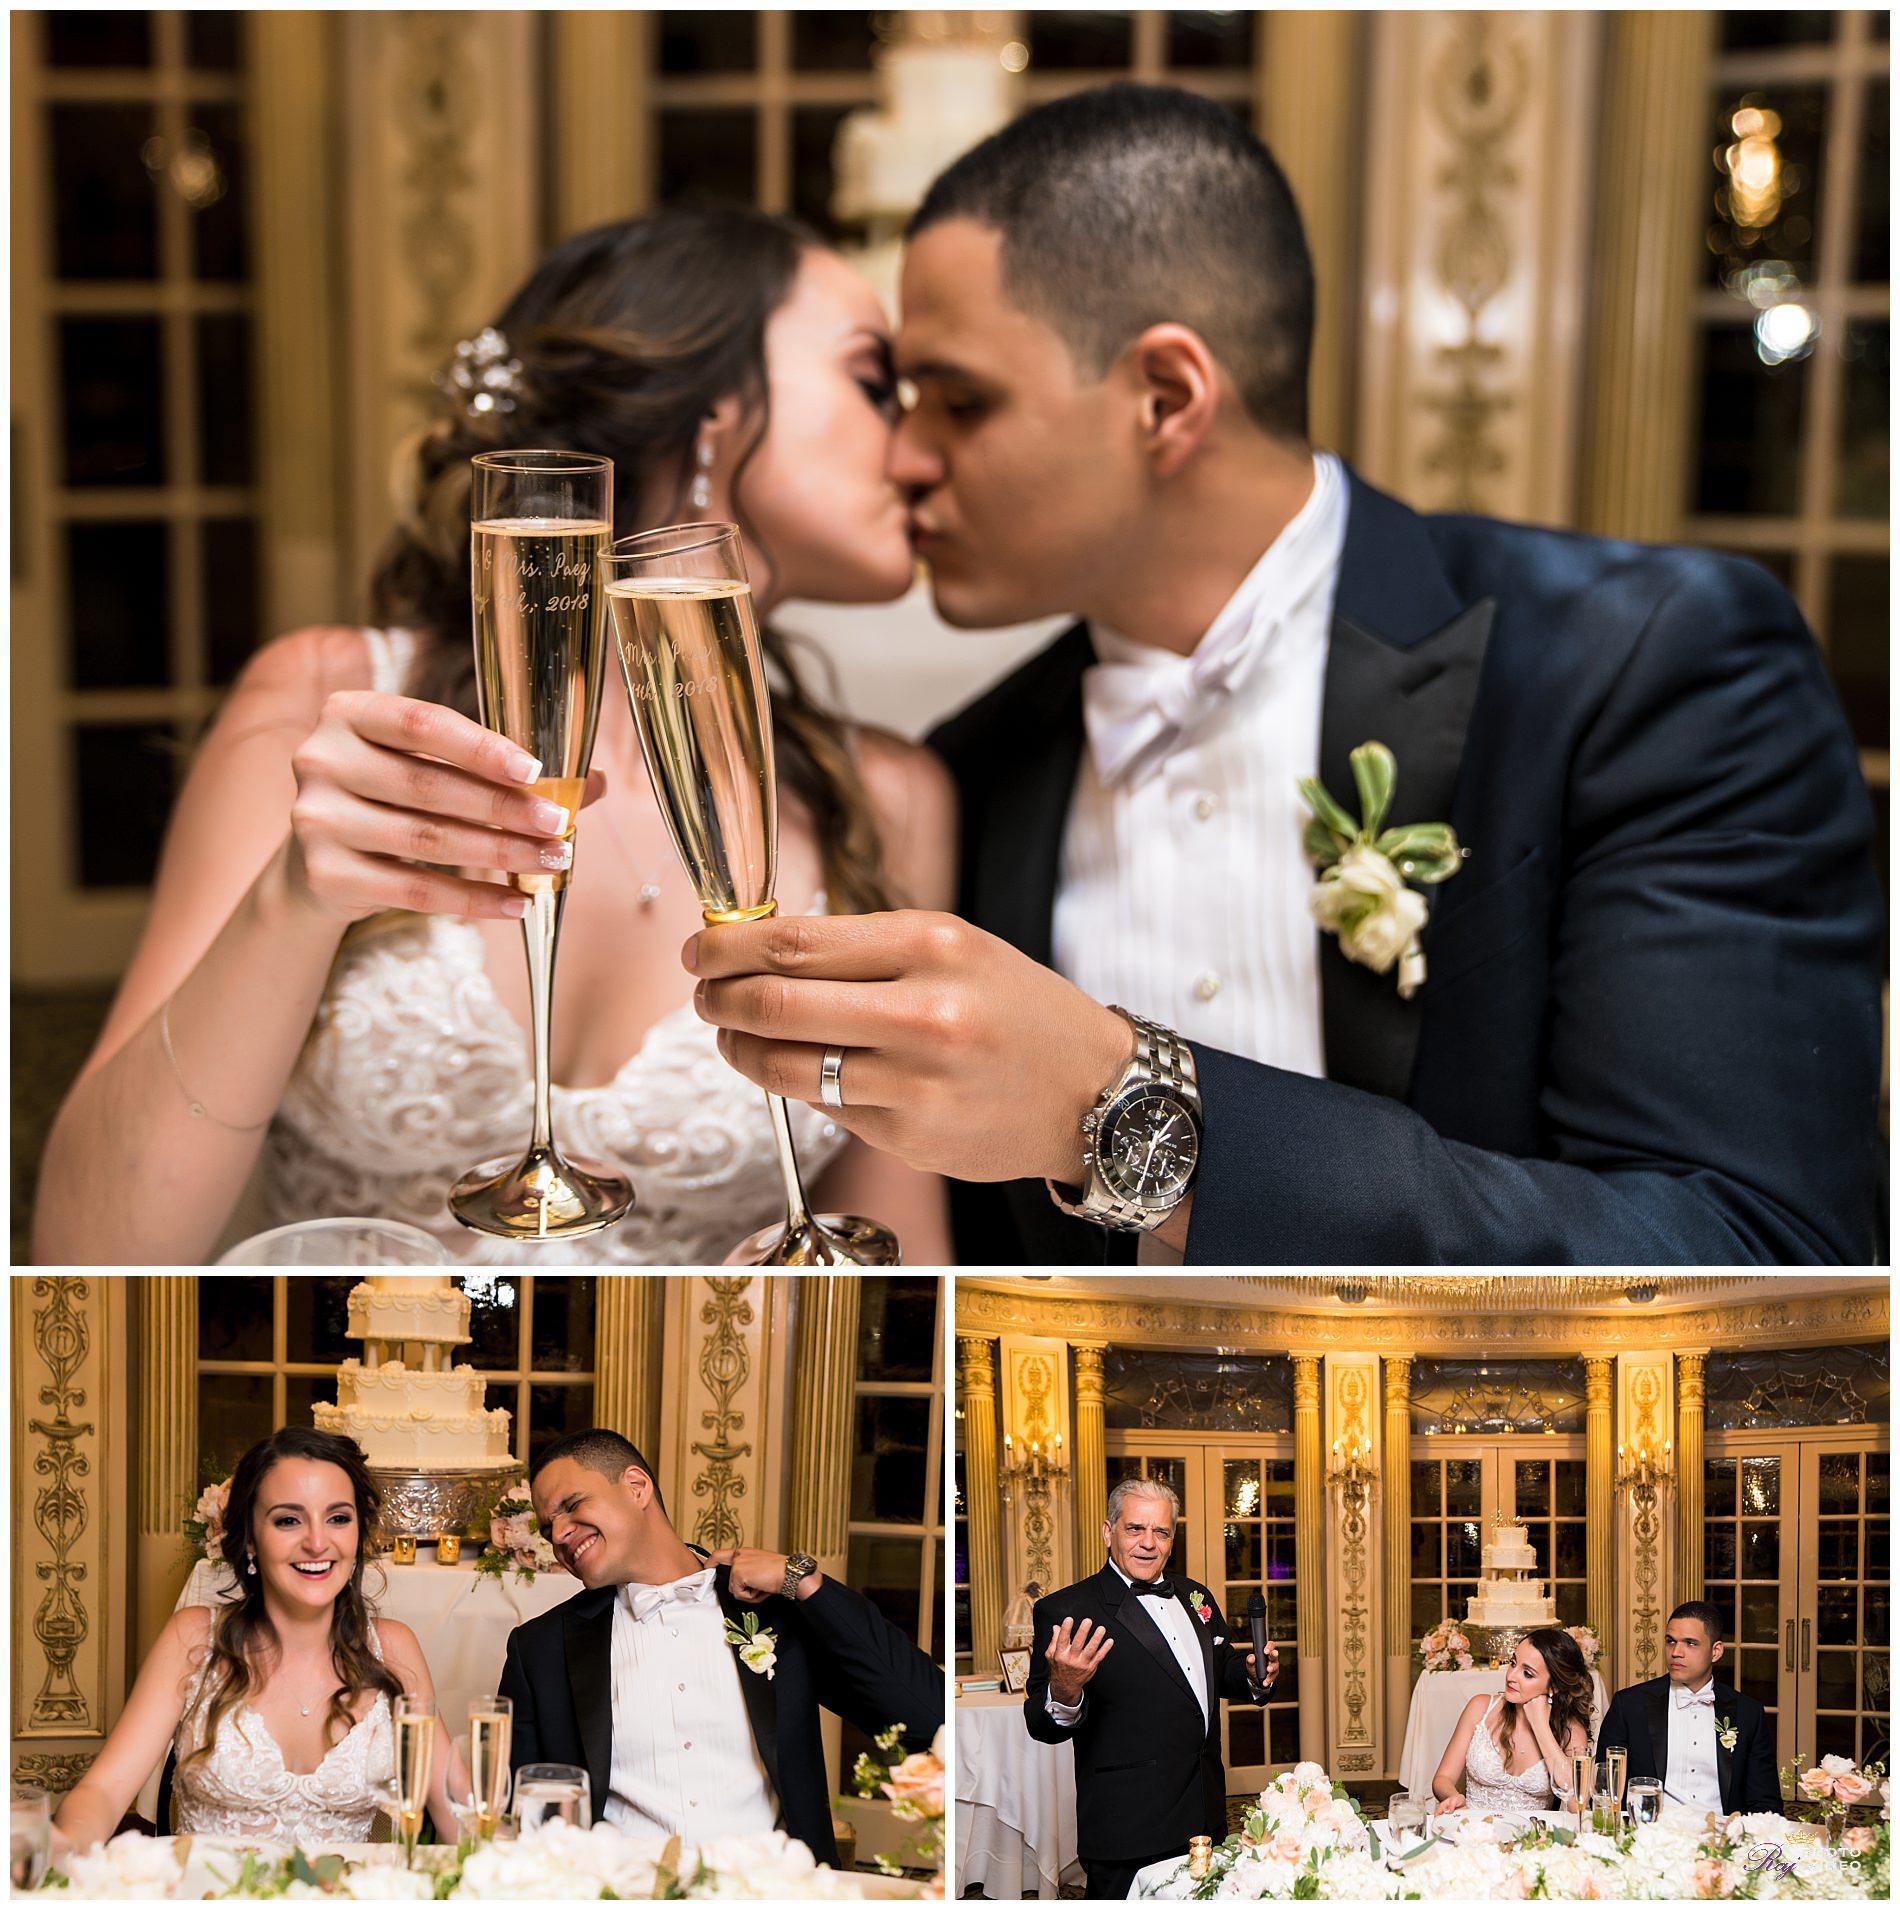 The-Manor-West-Orange-NJ-Wedding-Reception-Yanet-Jose-19.jpg